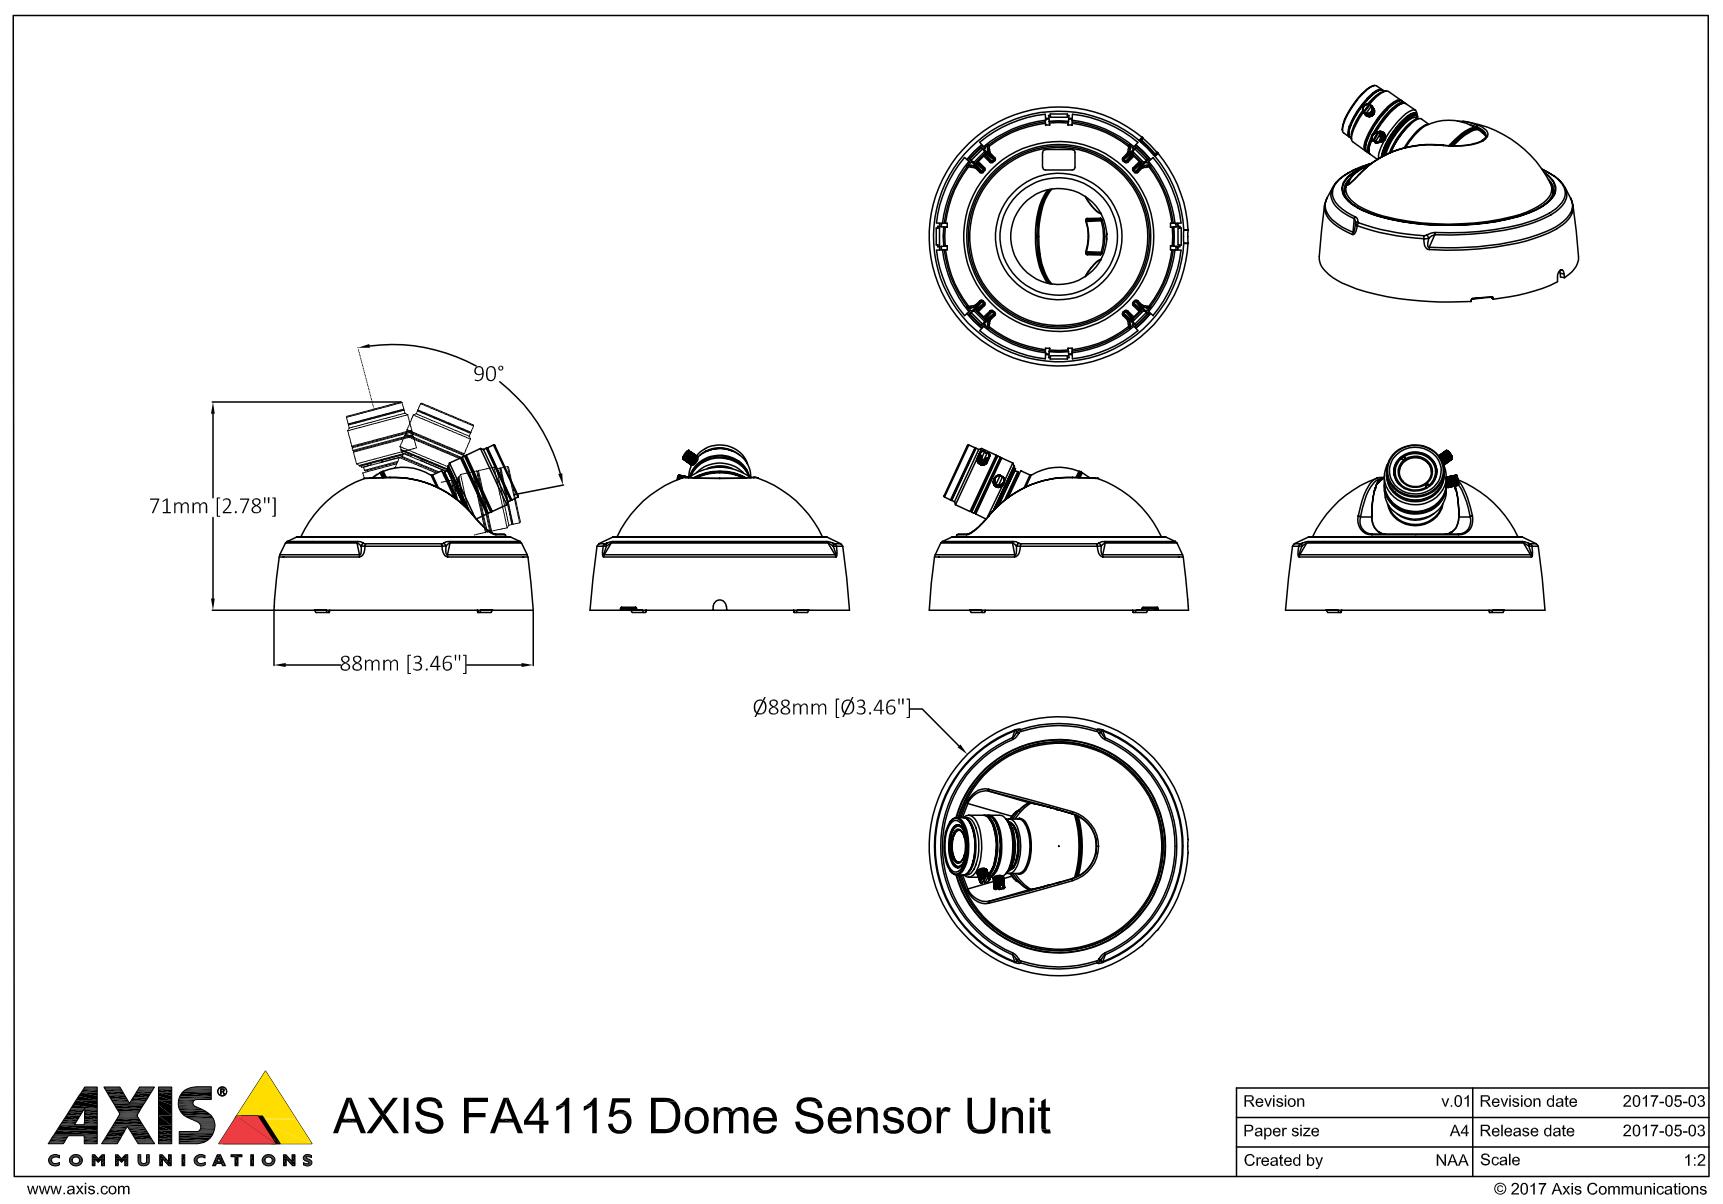 AXIS FA4115 Unit Dimensions